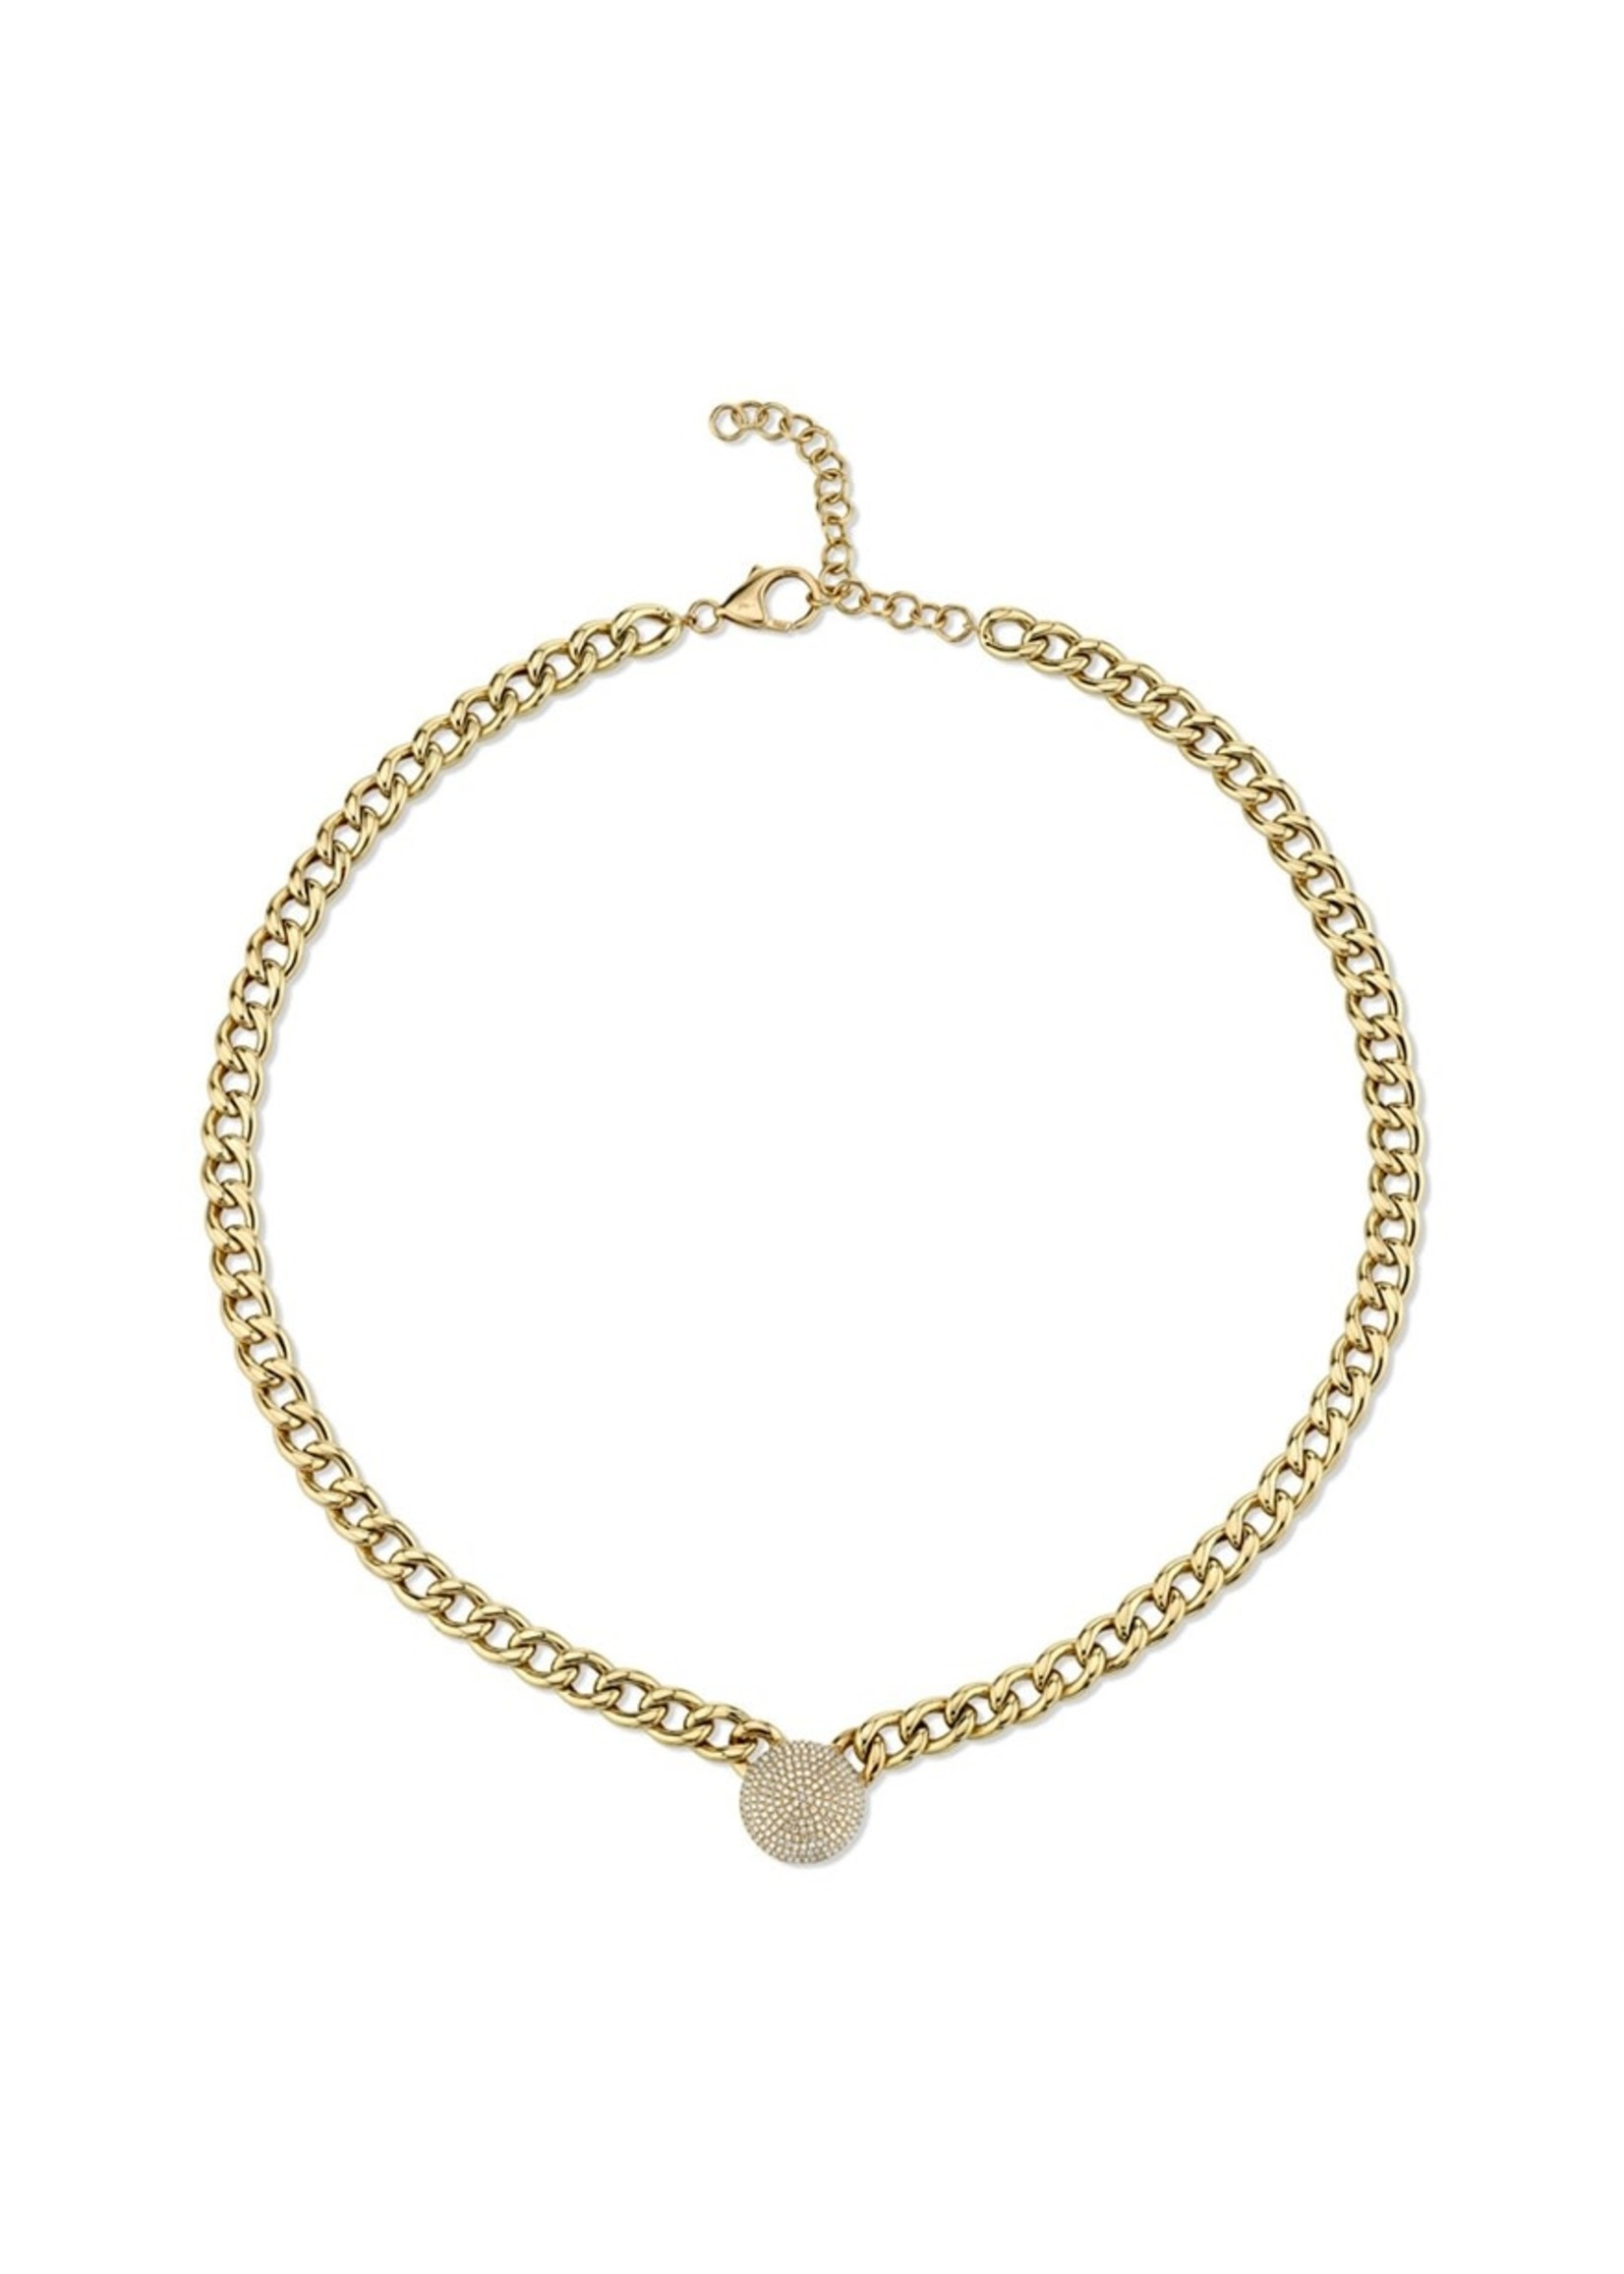 Jill Alberts Diamond Pave Chain Necklace